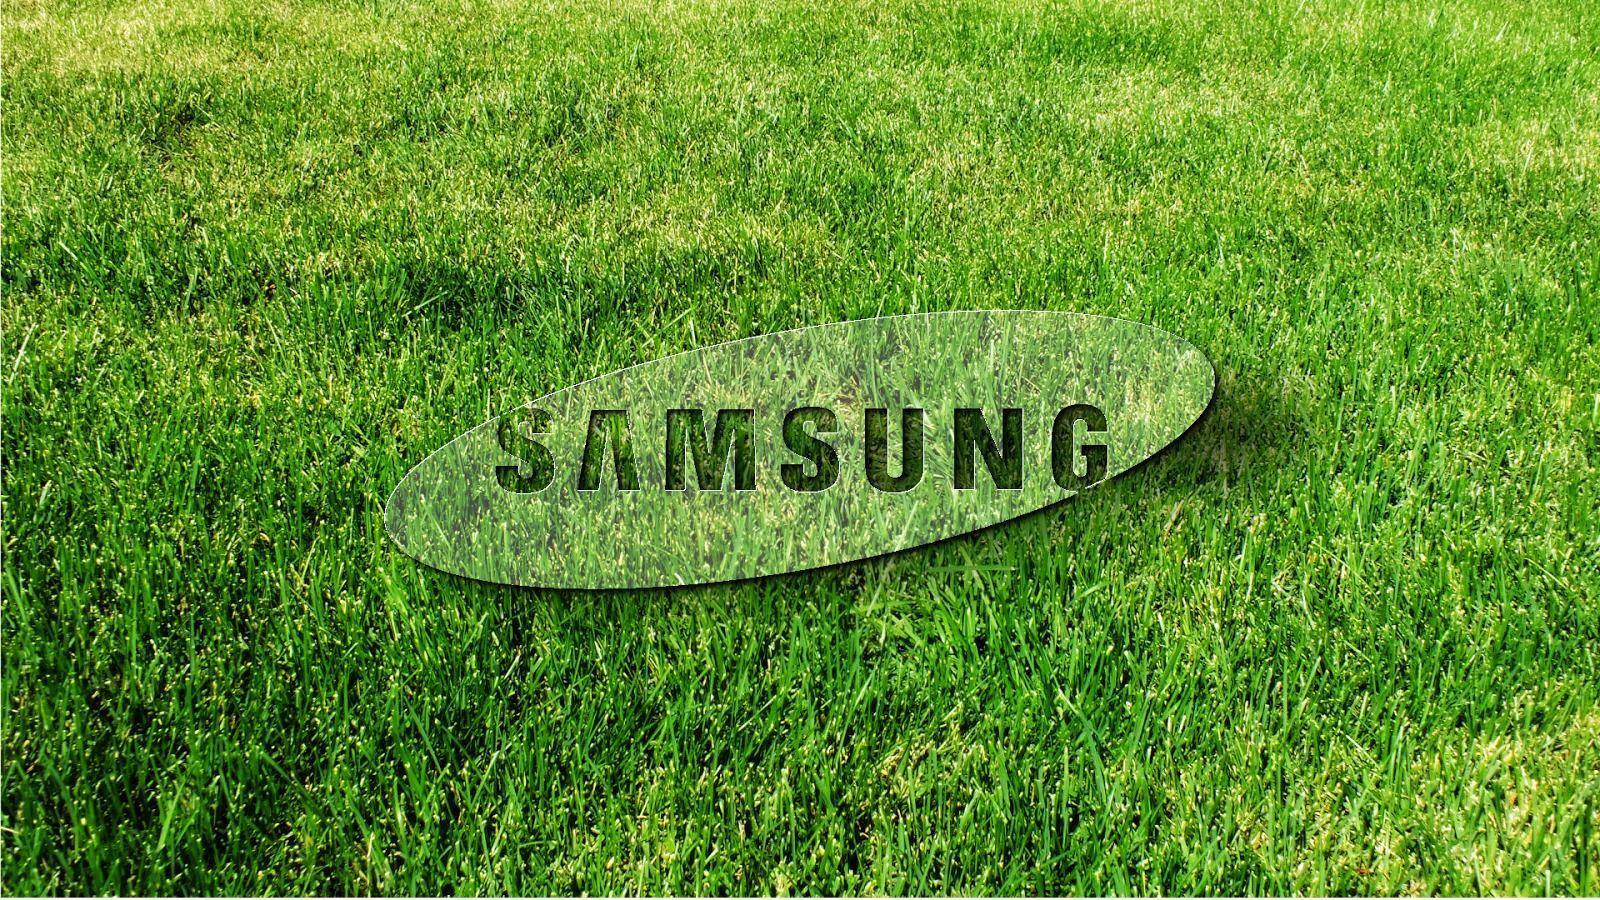 Hd wallpaper samsung - Hd Samsung Galaxy A Wallpapers